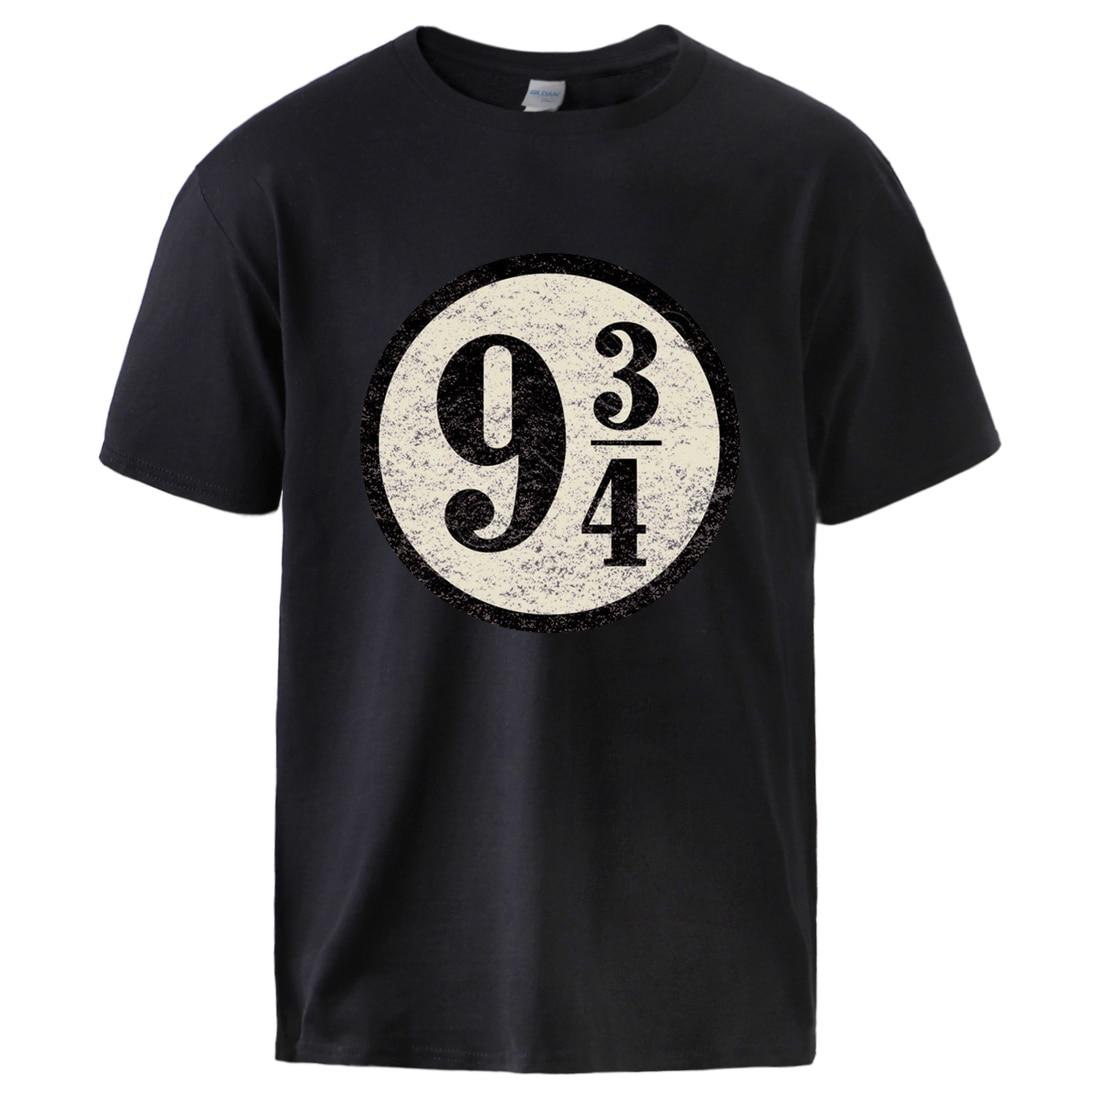 Nine And Three Quarters Tshirt For Man 2020 Summer Platform 9-3/4 Hogwarts 100% Cotton Sportswear Top Tee Male Causal Streetwear